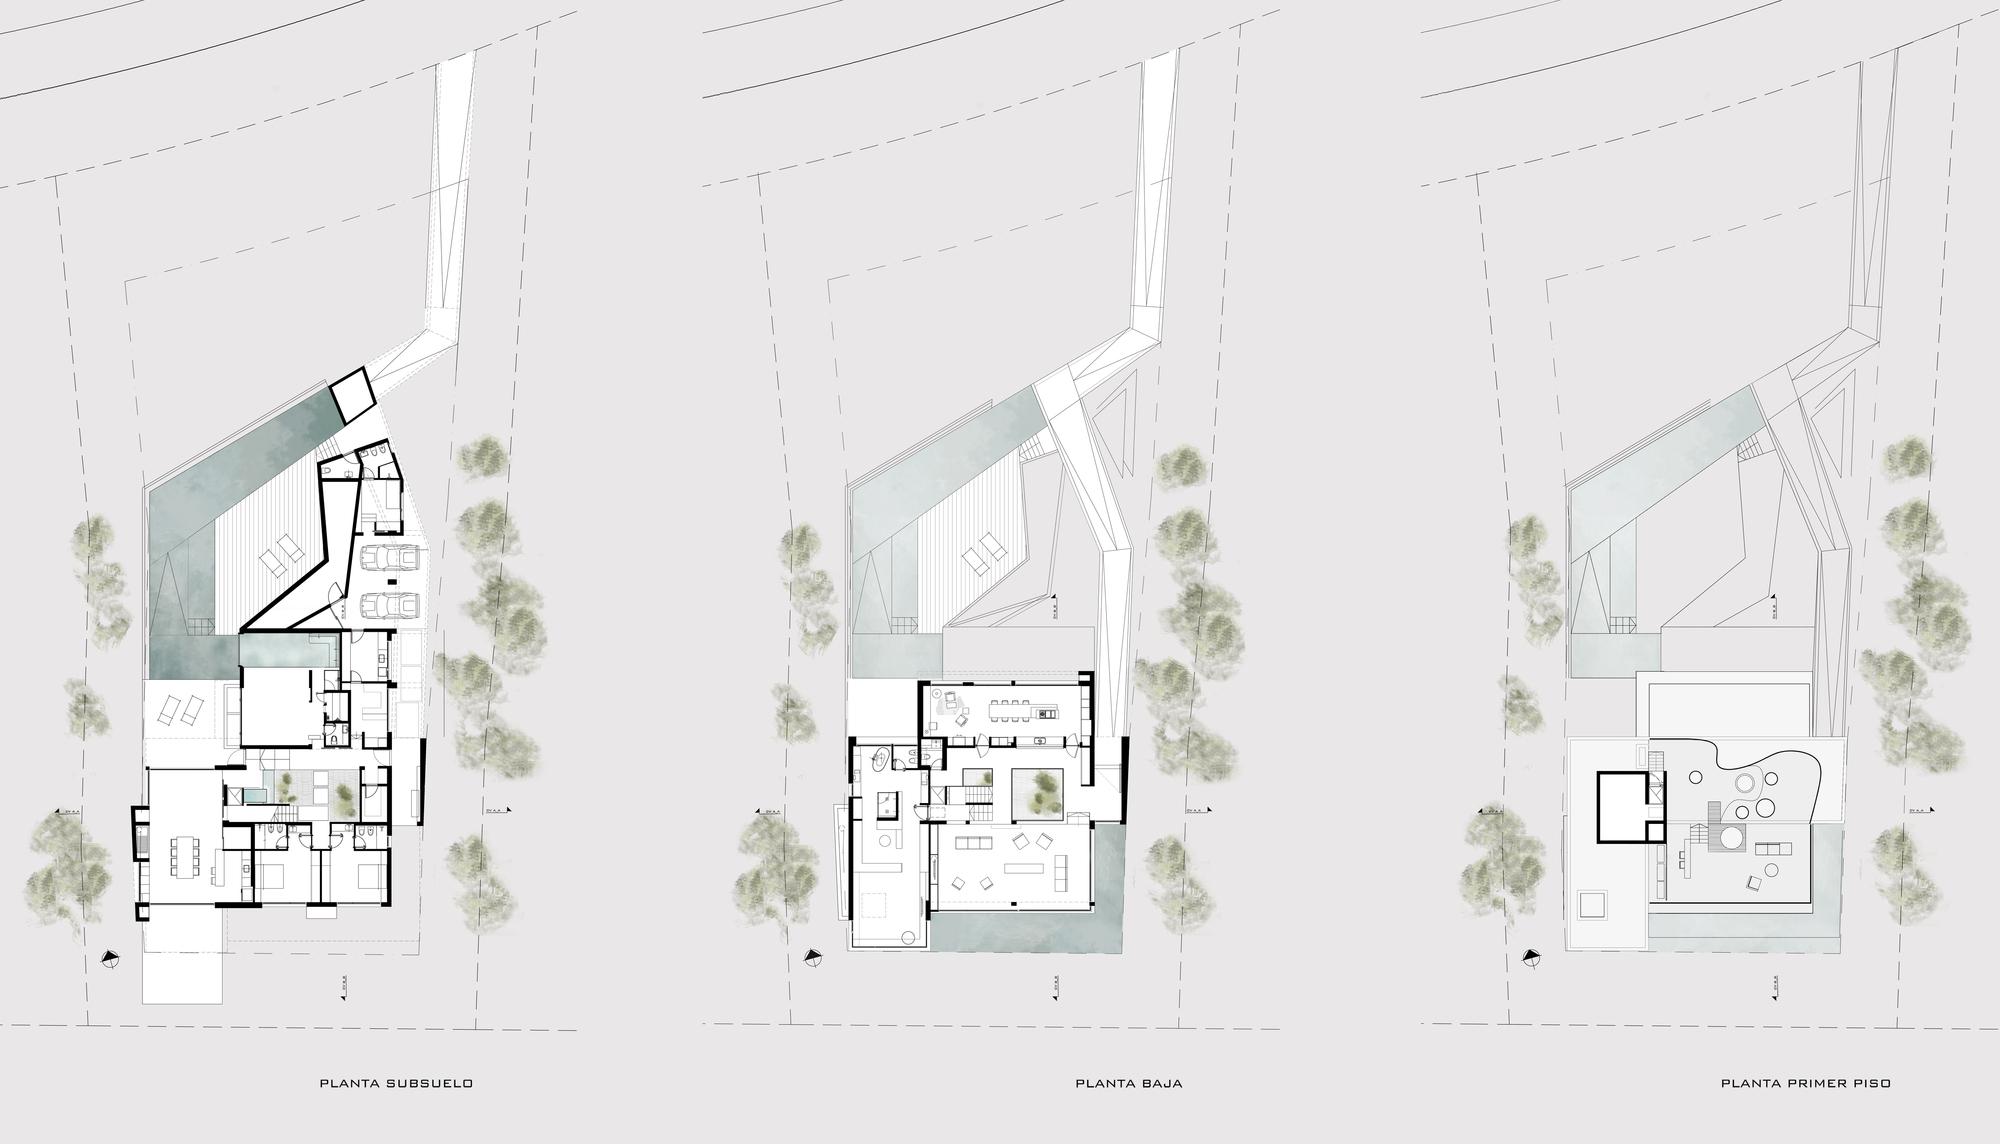 Gallery Of Casa Rampa Andr S Remy Arquitectos 19